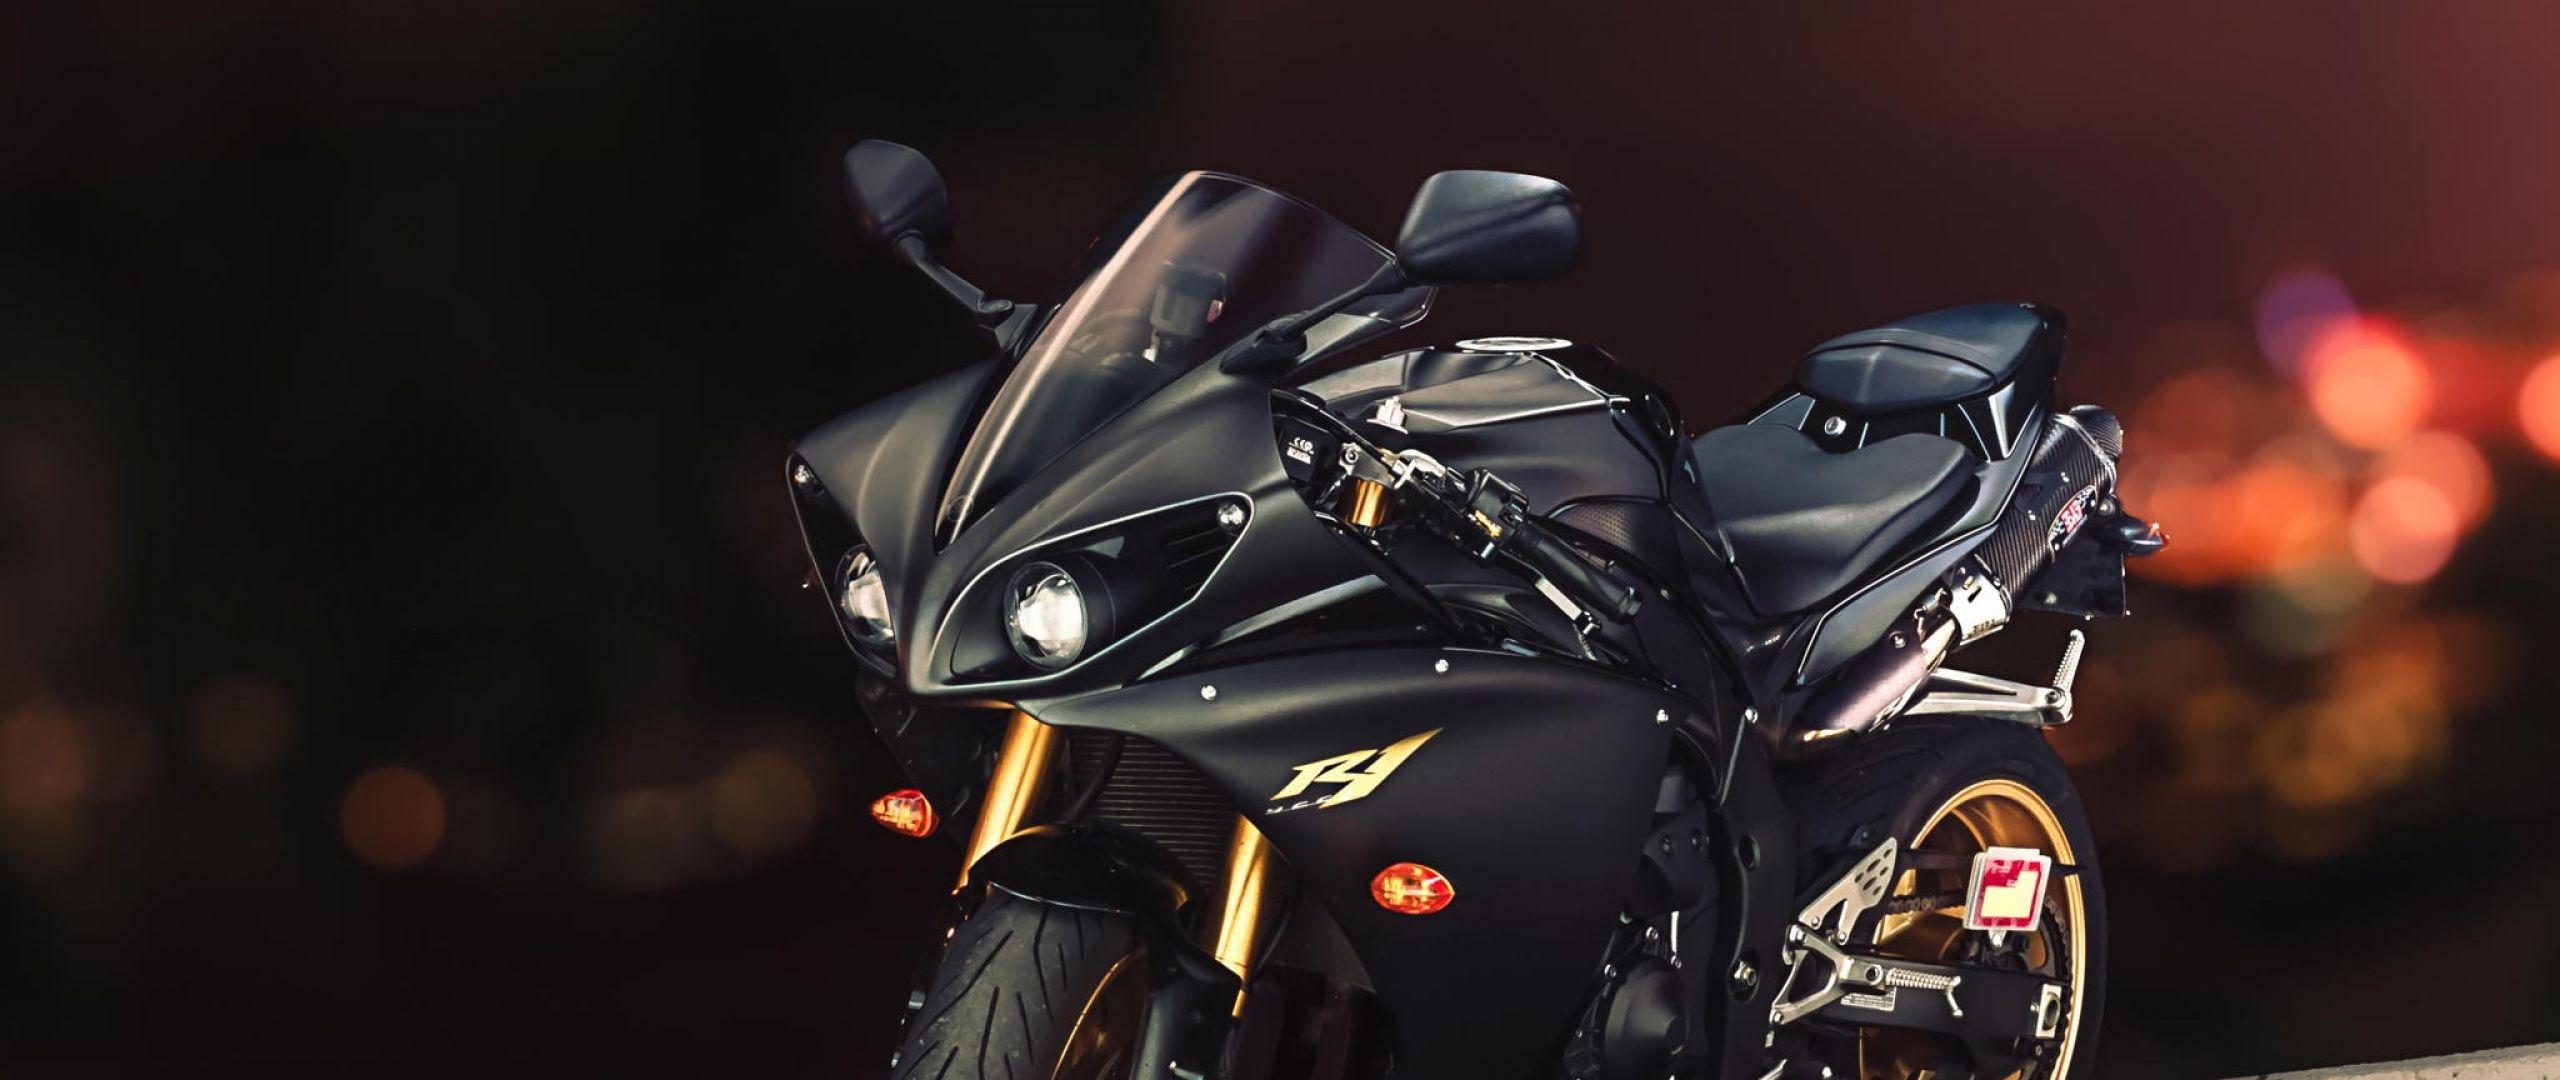 hd background yamaha yzf r1 sport bike black and gold wallpaper ... - Mobili Tv Yamaha